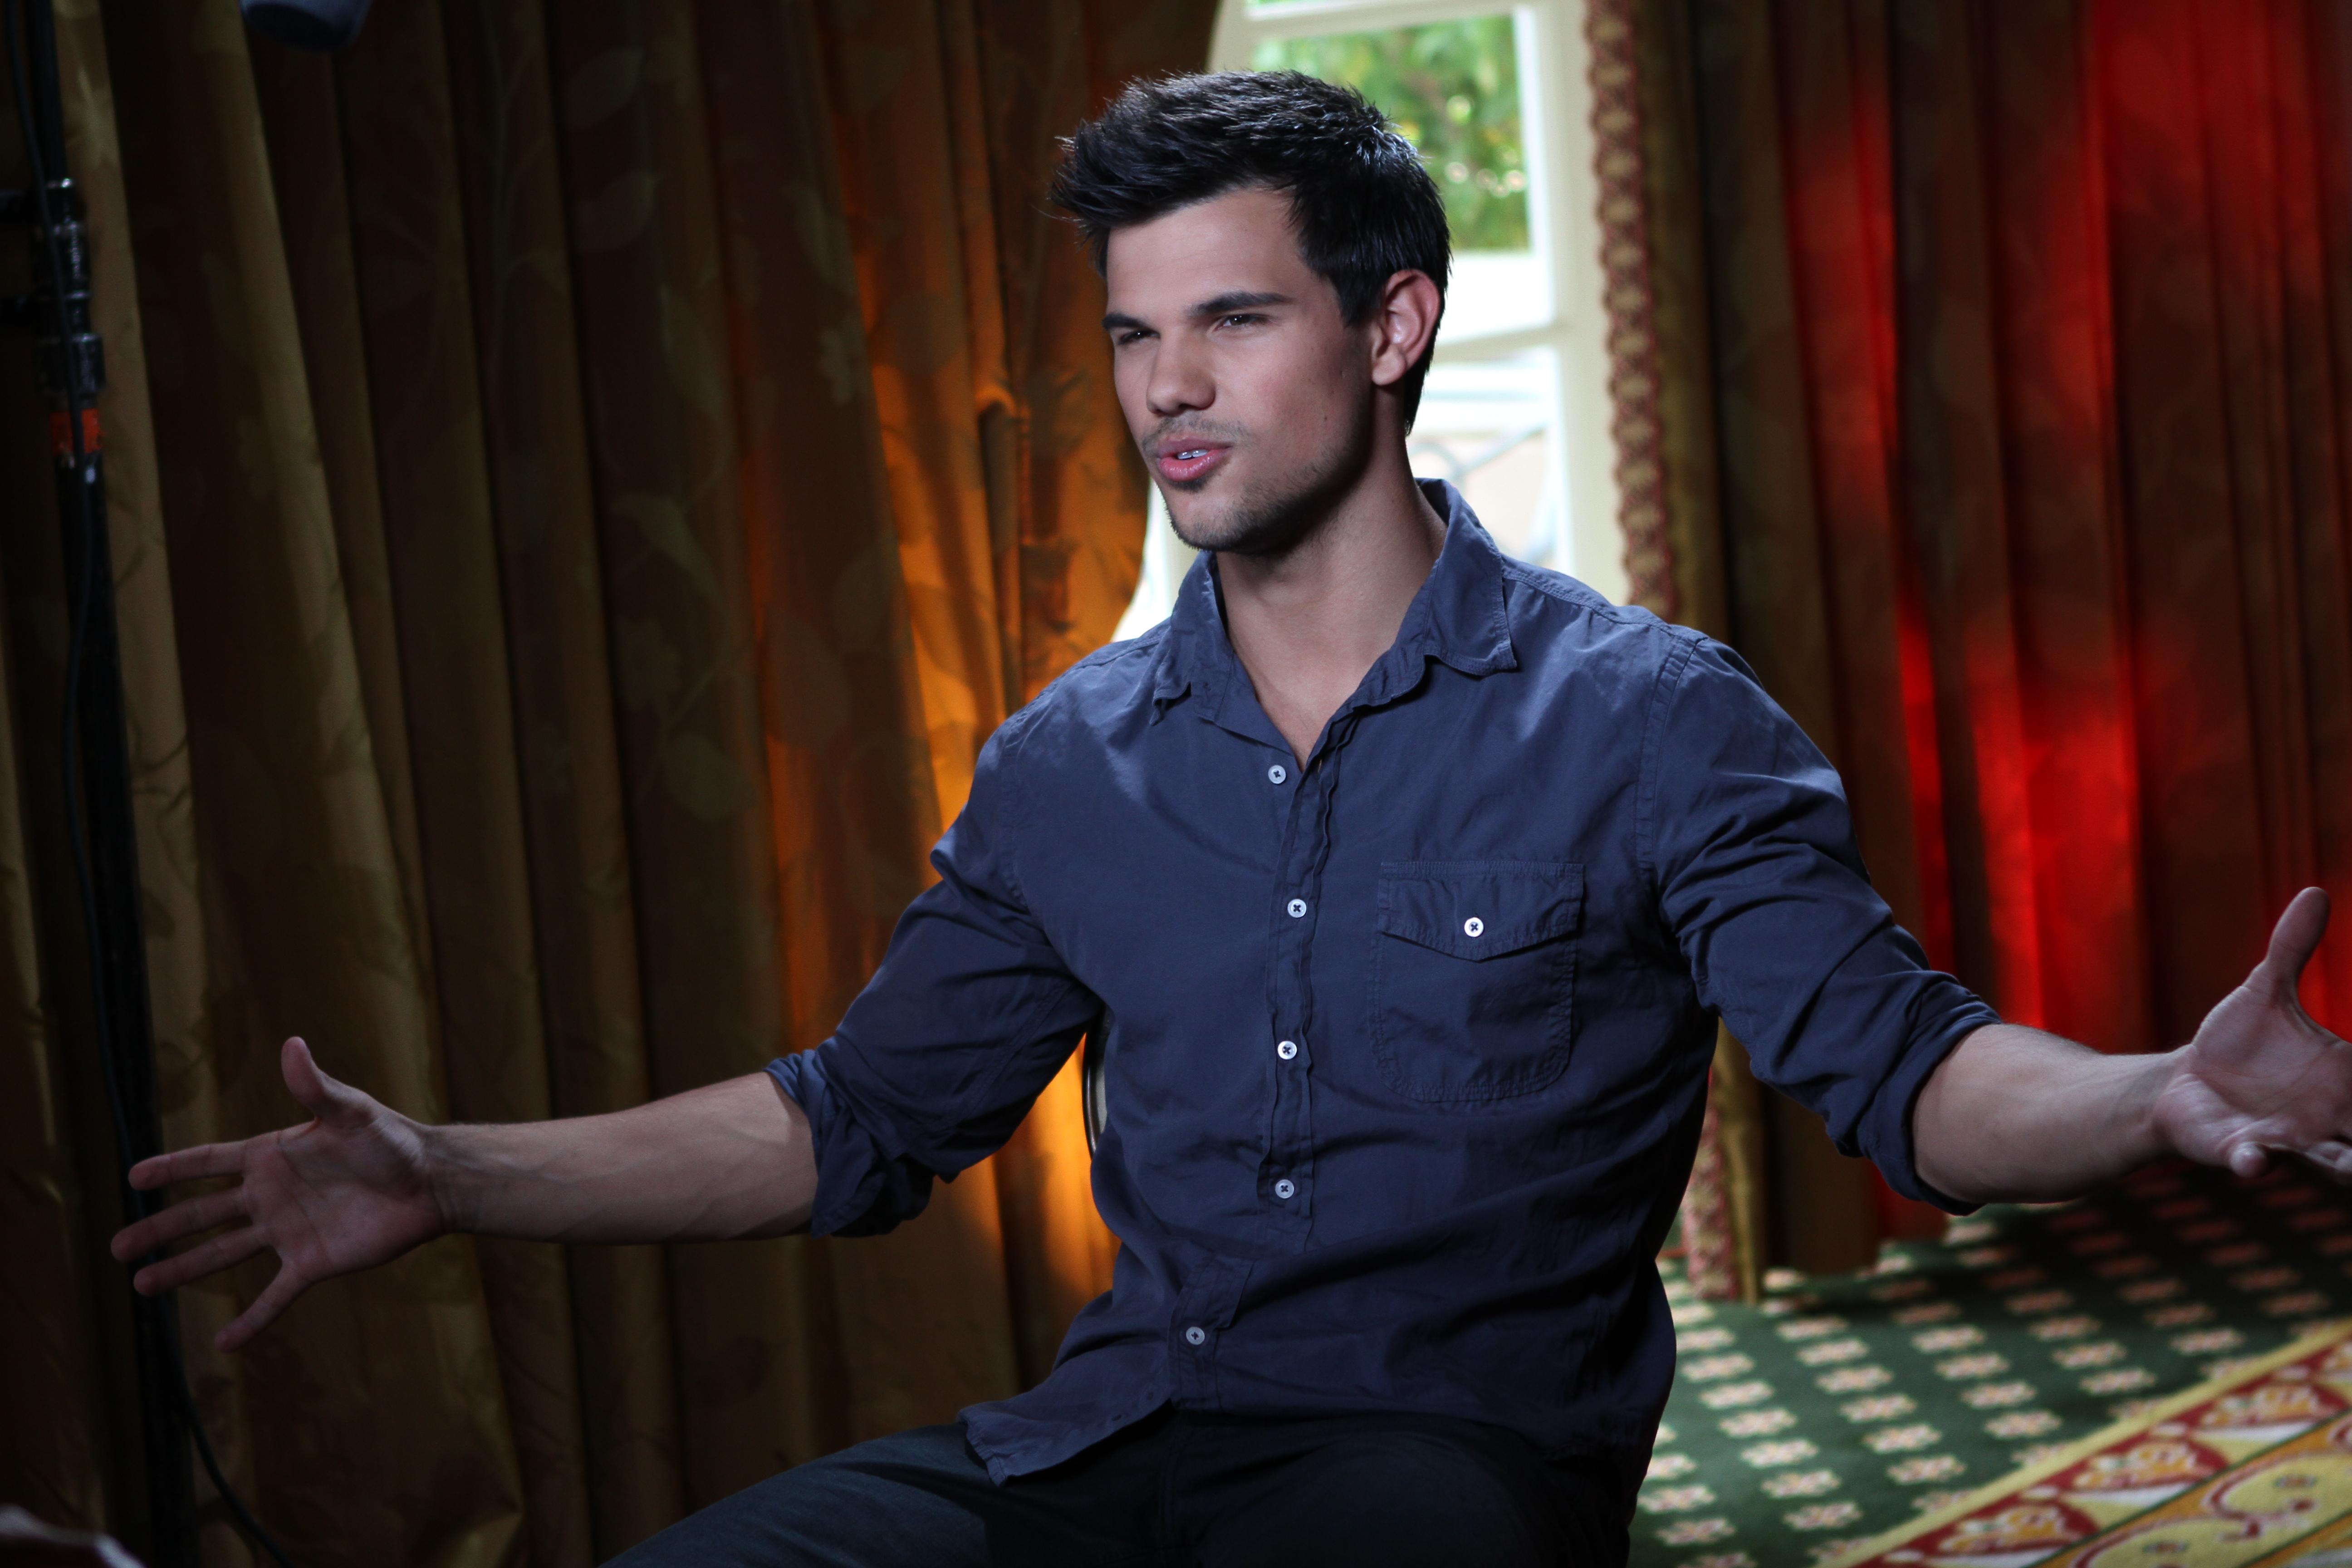 Taylor Lautner On Jacobs Breaking Dawn Heartbreak Over Bella He